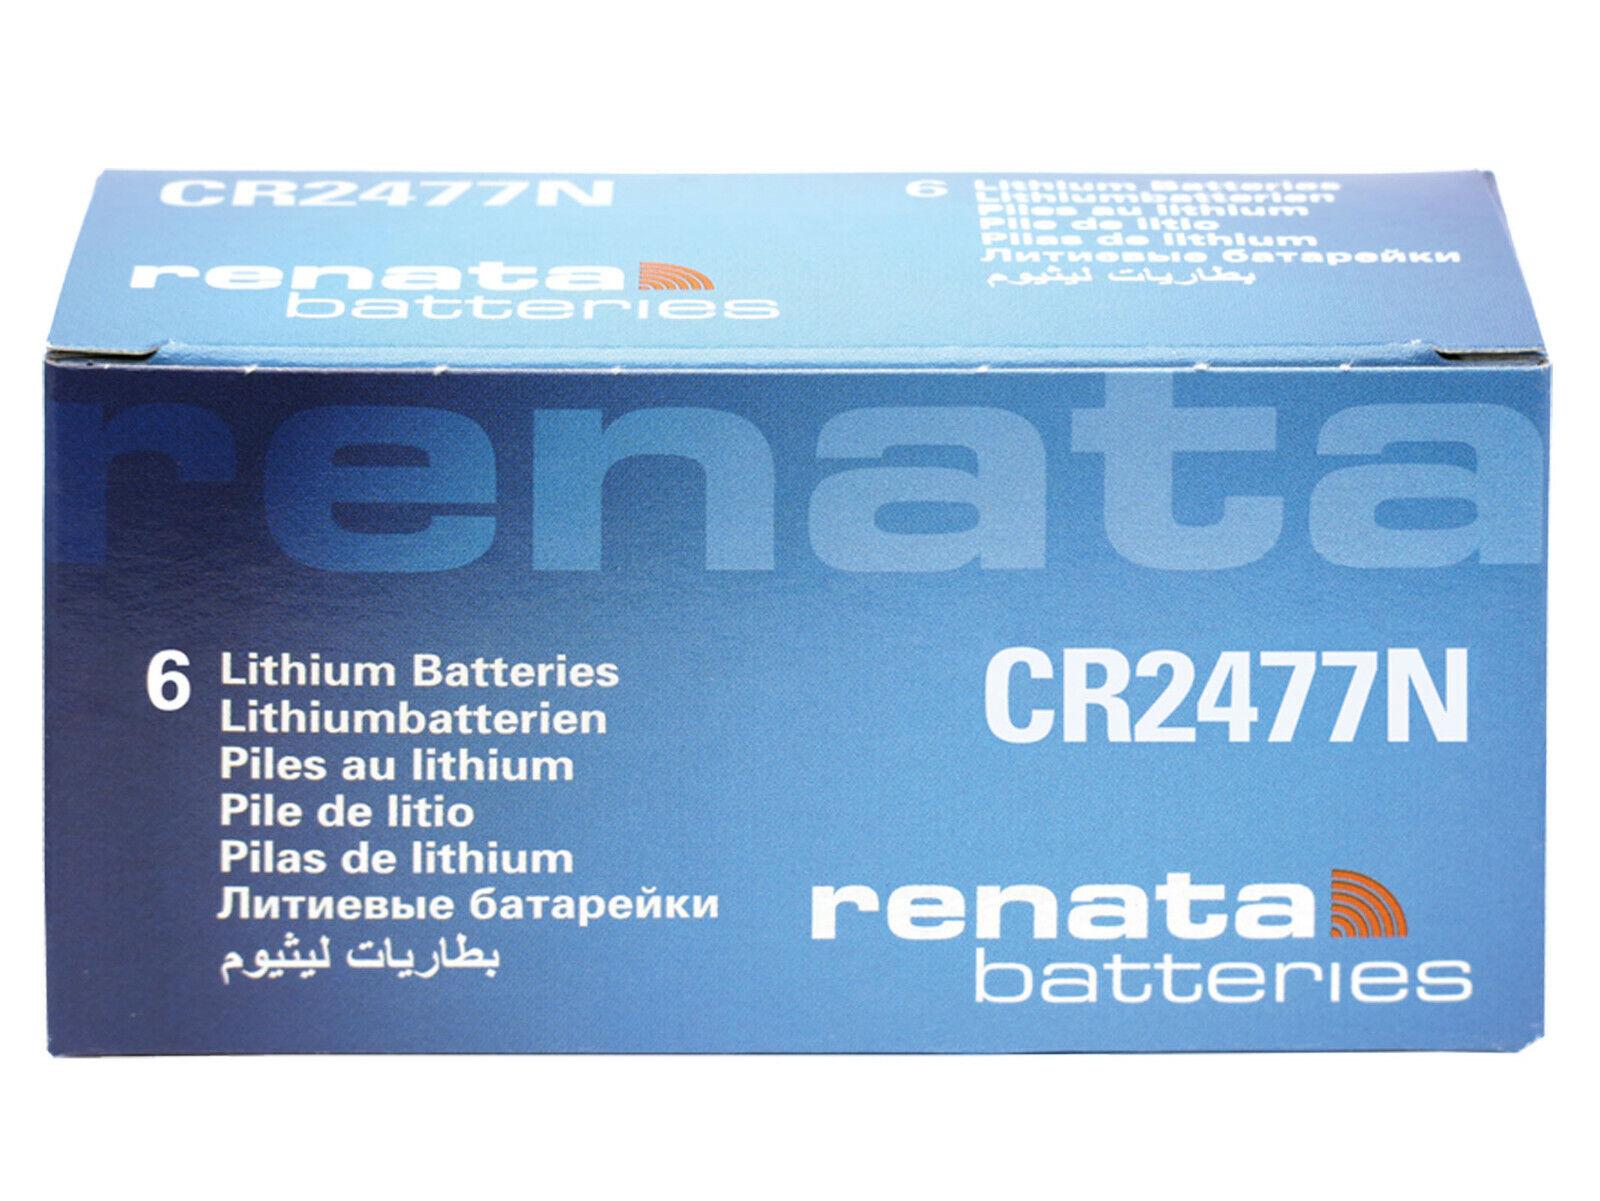 6x renata cr2477n 3v cell coin battery lot replace CR DL BR ECR kcr ml